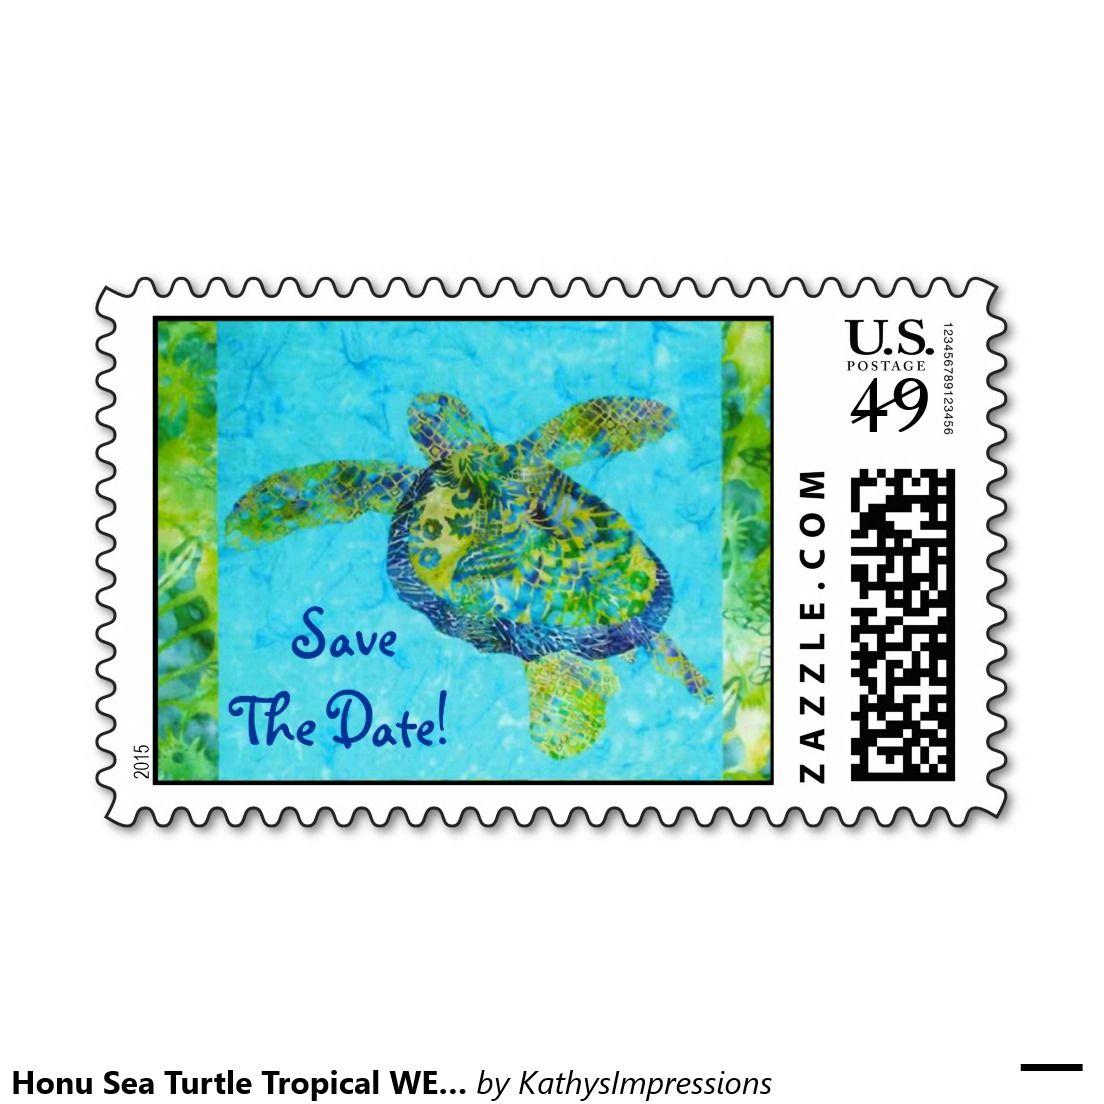 Honu Sea Turtle Tropical WEDDING STAMPS Postage   Zazzle